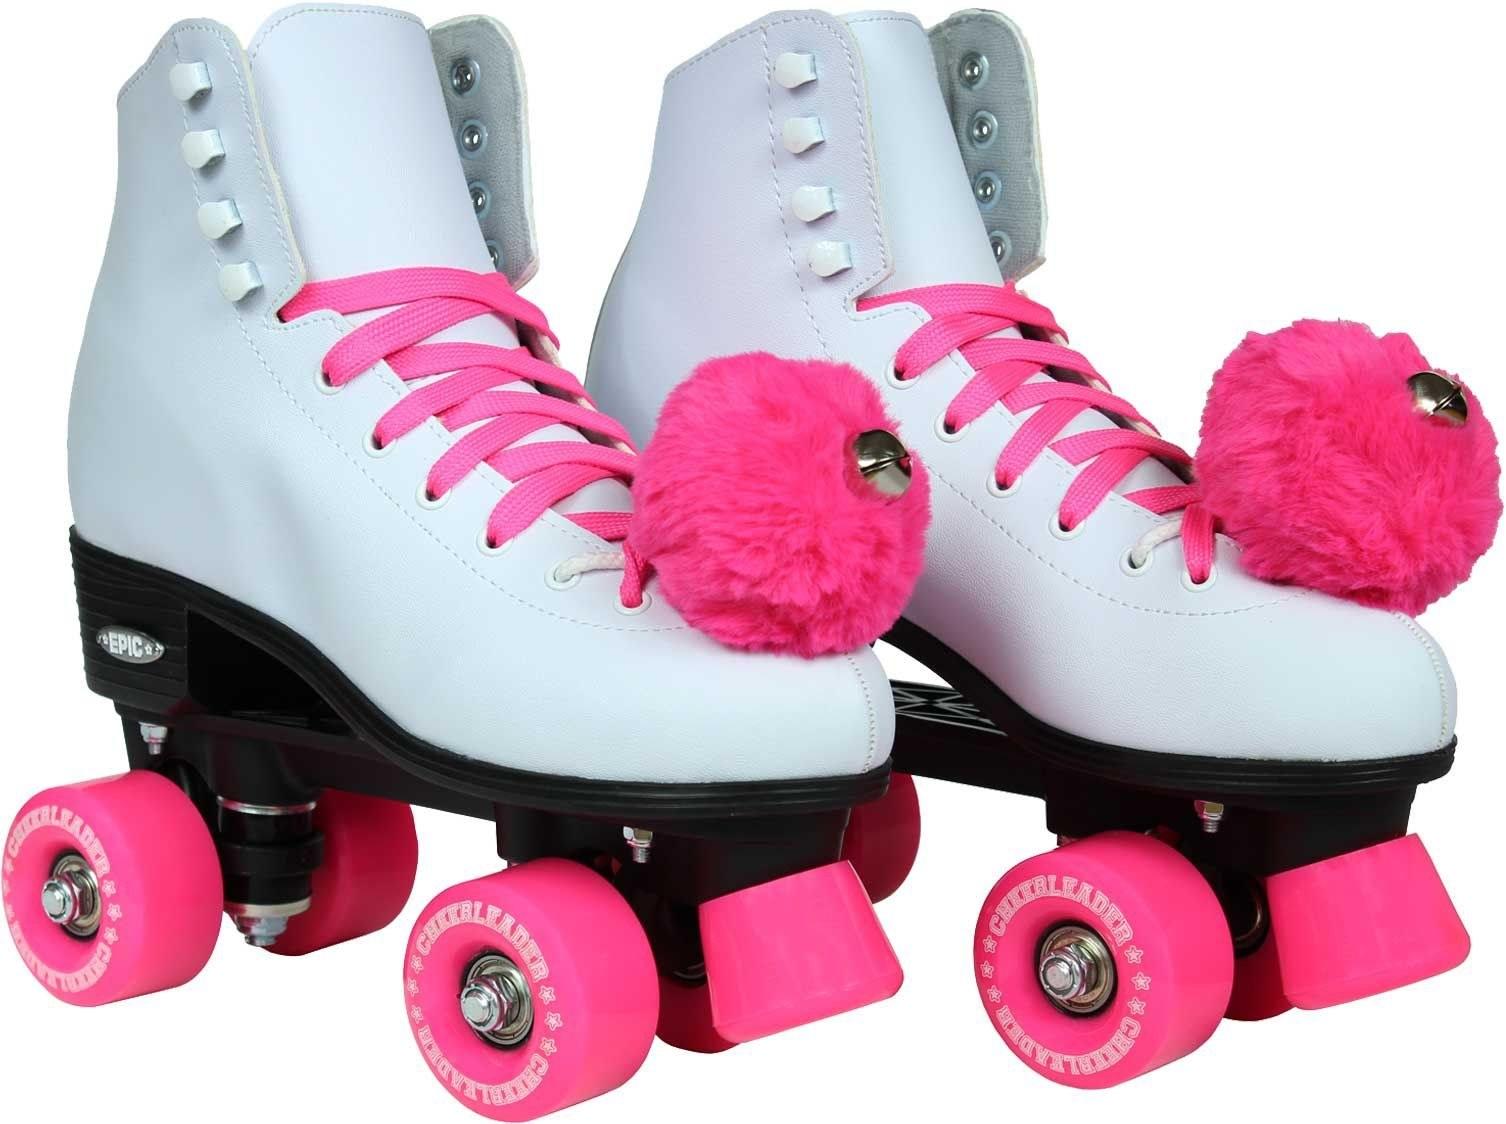 a pair of epic women's cheerleader quad roller skates